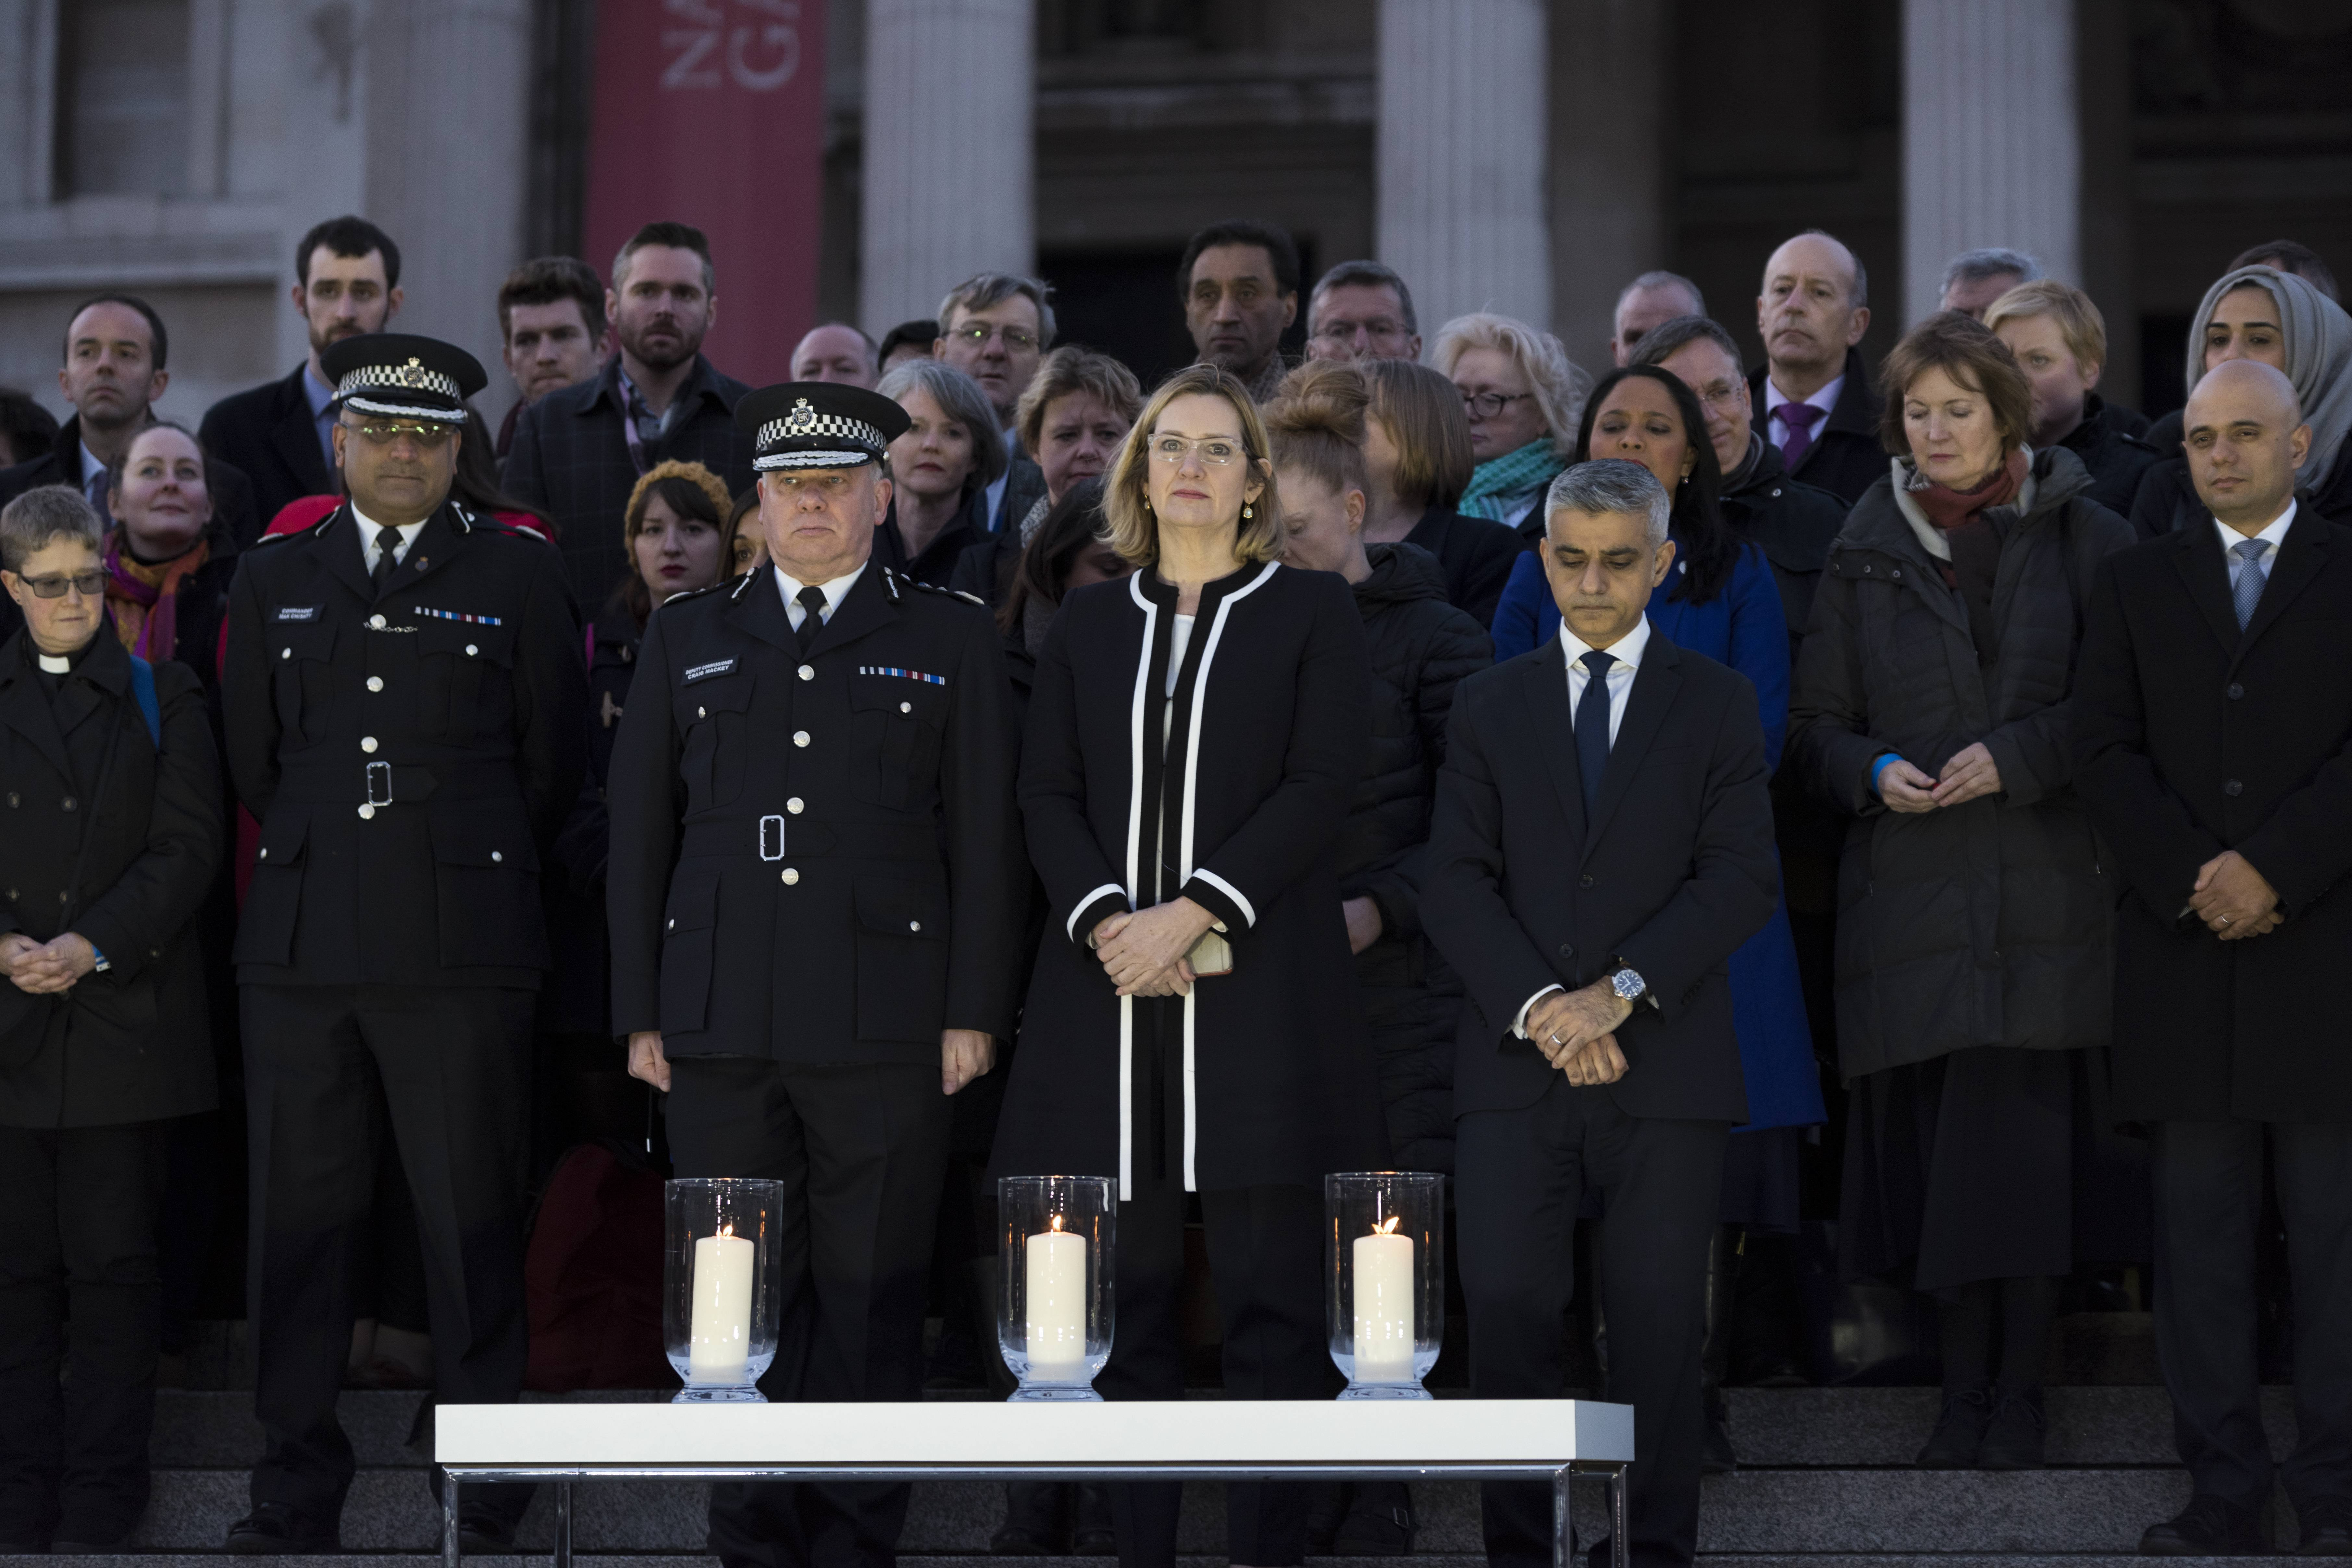 Amber Rudd Police Memorial